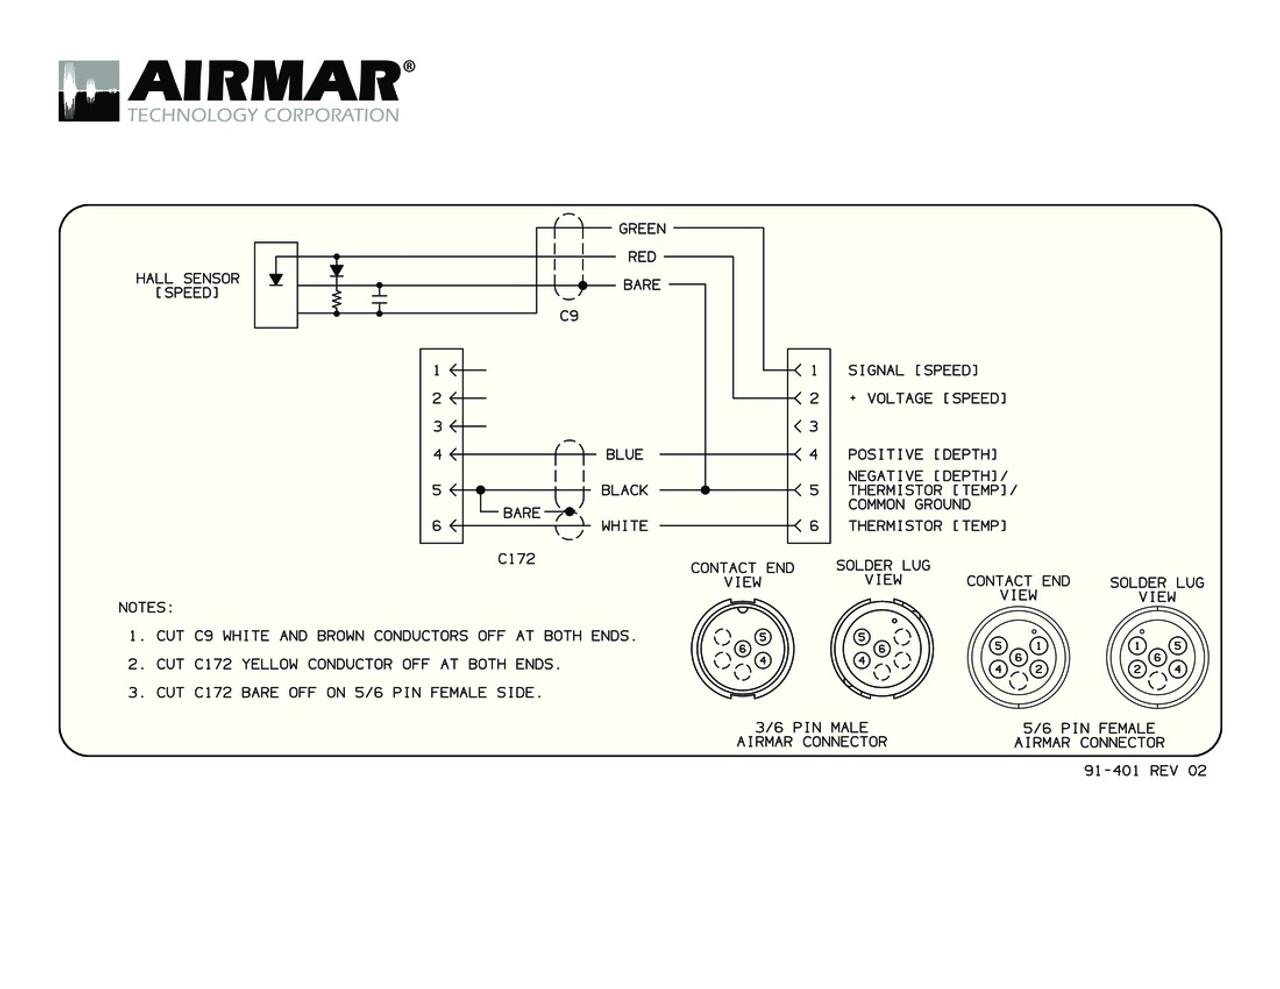 Wiring Diagram For Garmin 3205 - Wiring Diagram K9 on